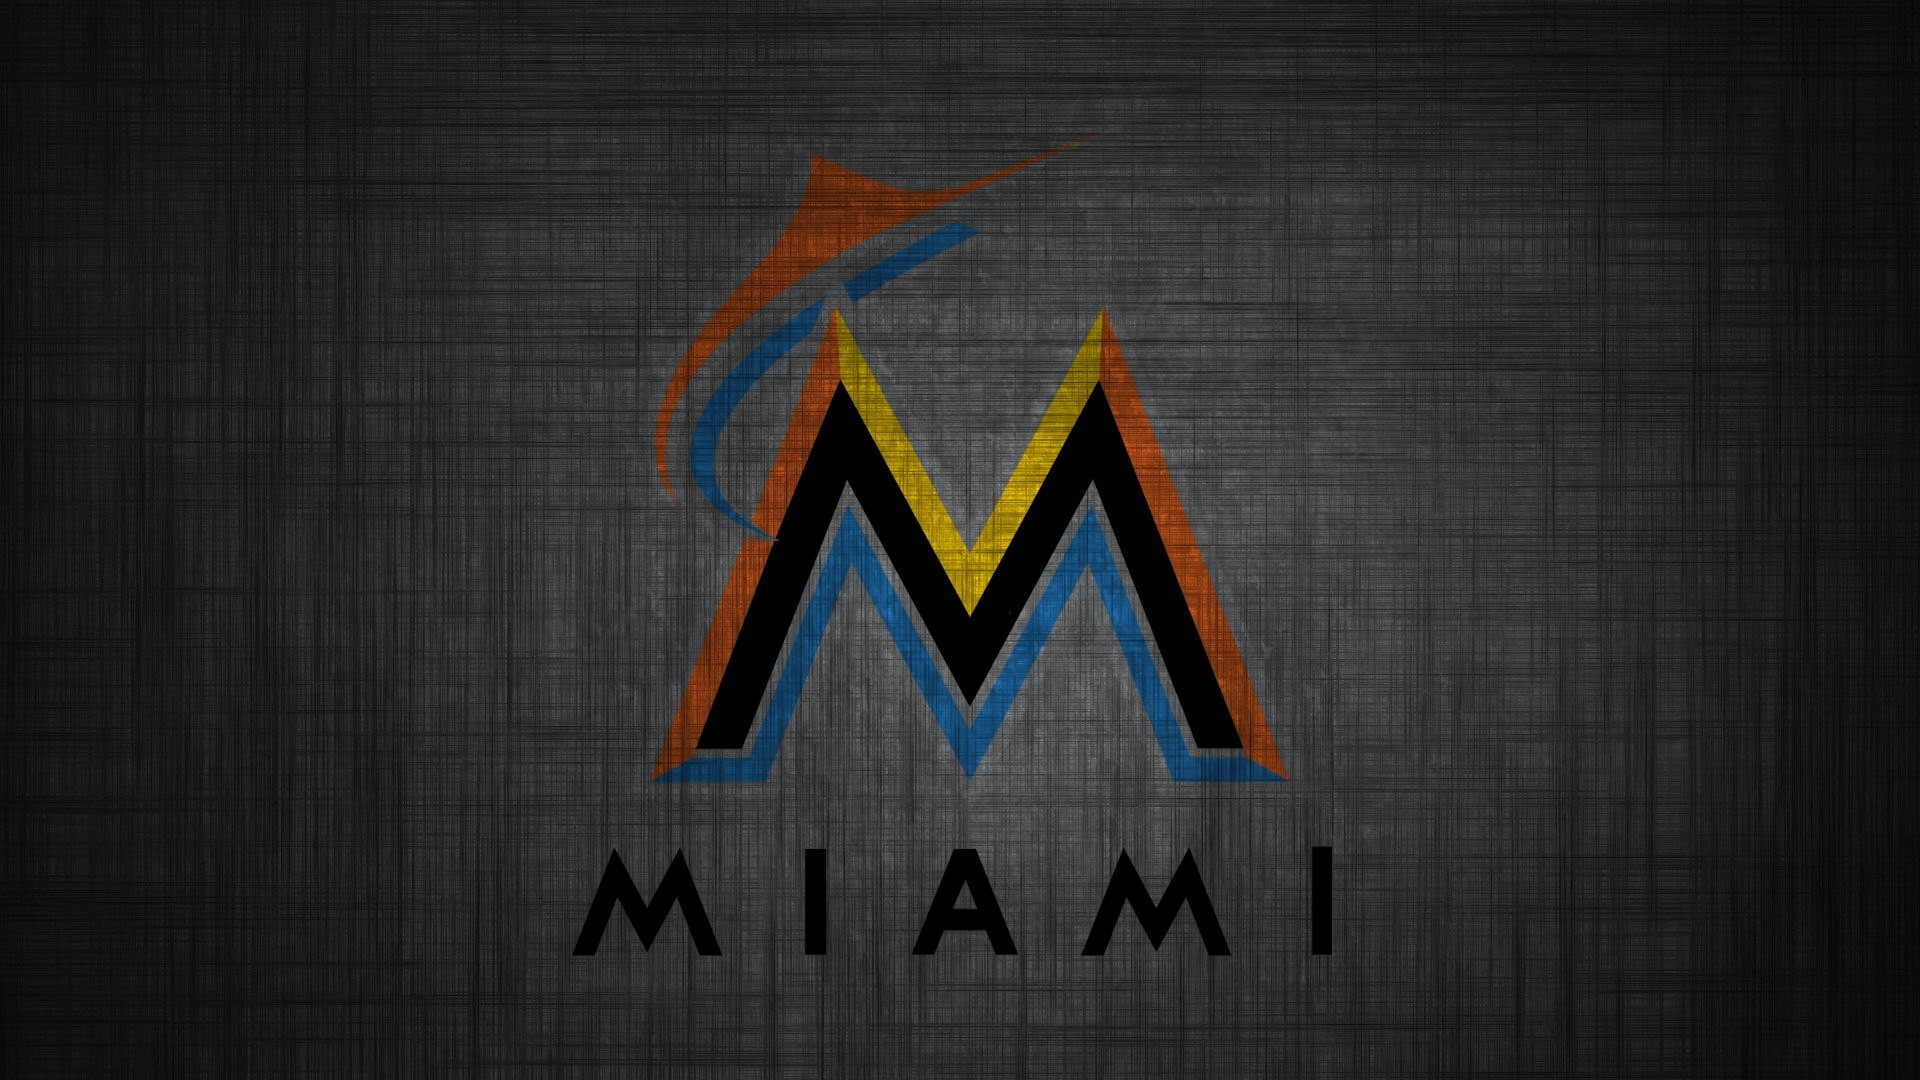 … amazing miami marlins wallpaper world s greatest art site …